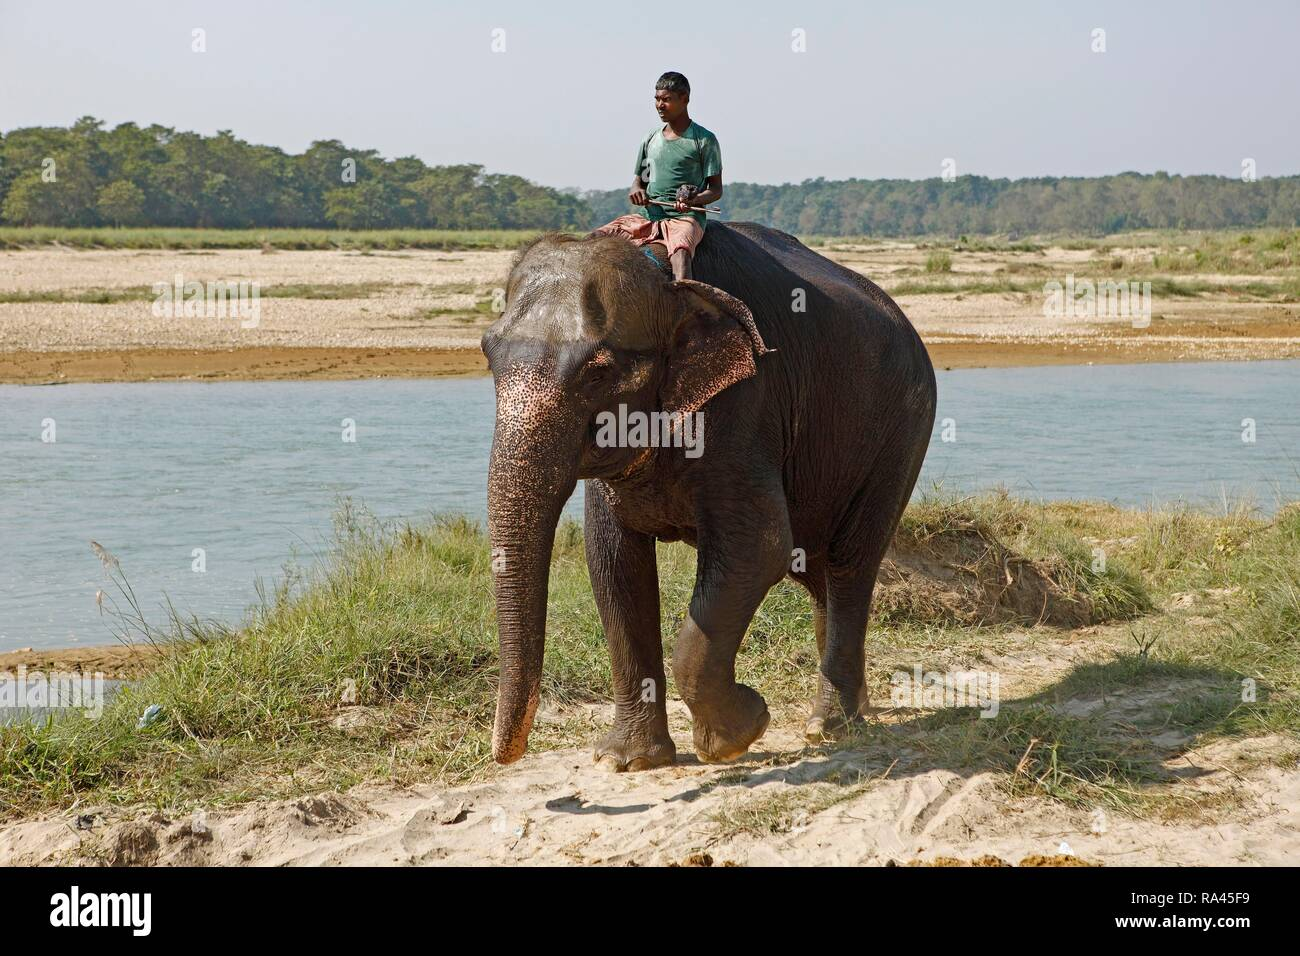 Mahut on a Elephant (Elephantidae), Sauraha, Chitwan National Park, Terai lowlands, Nepal - Stock Image